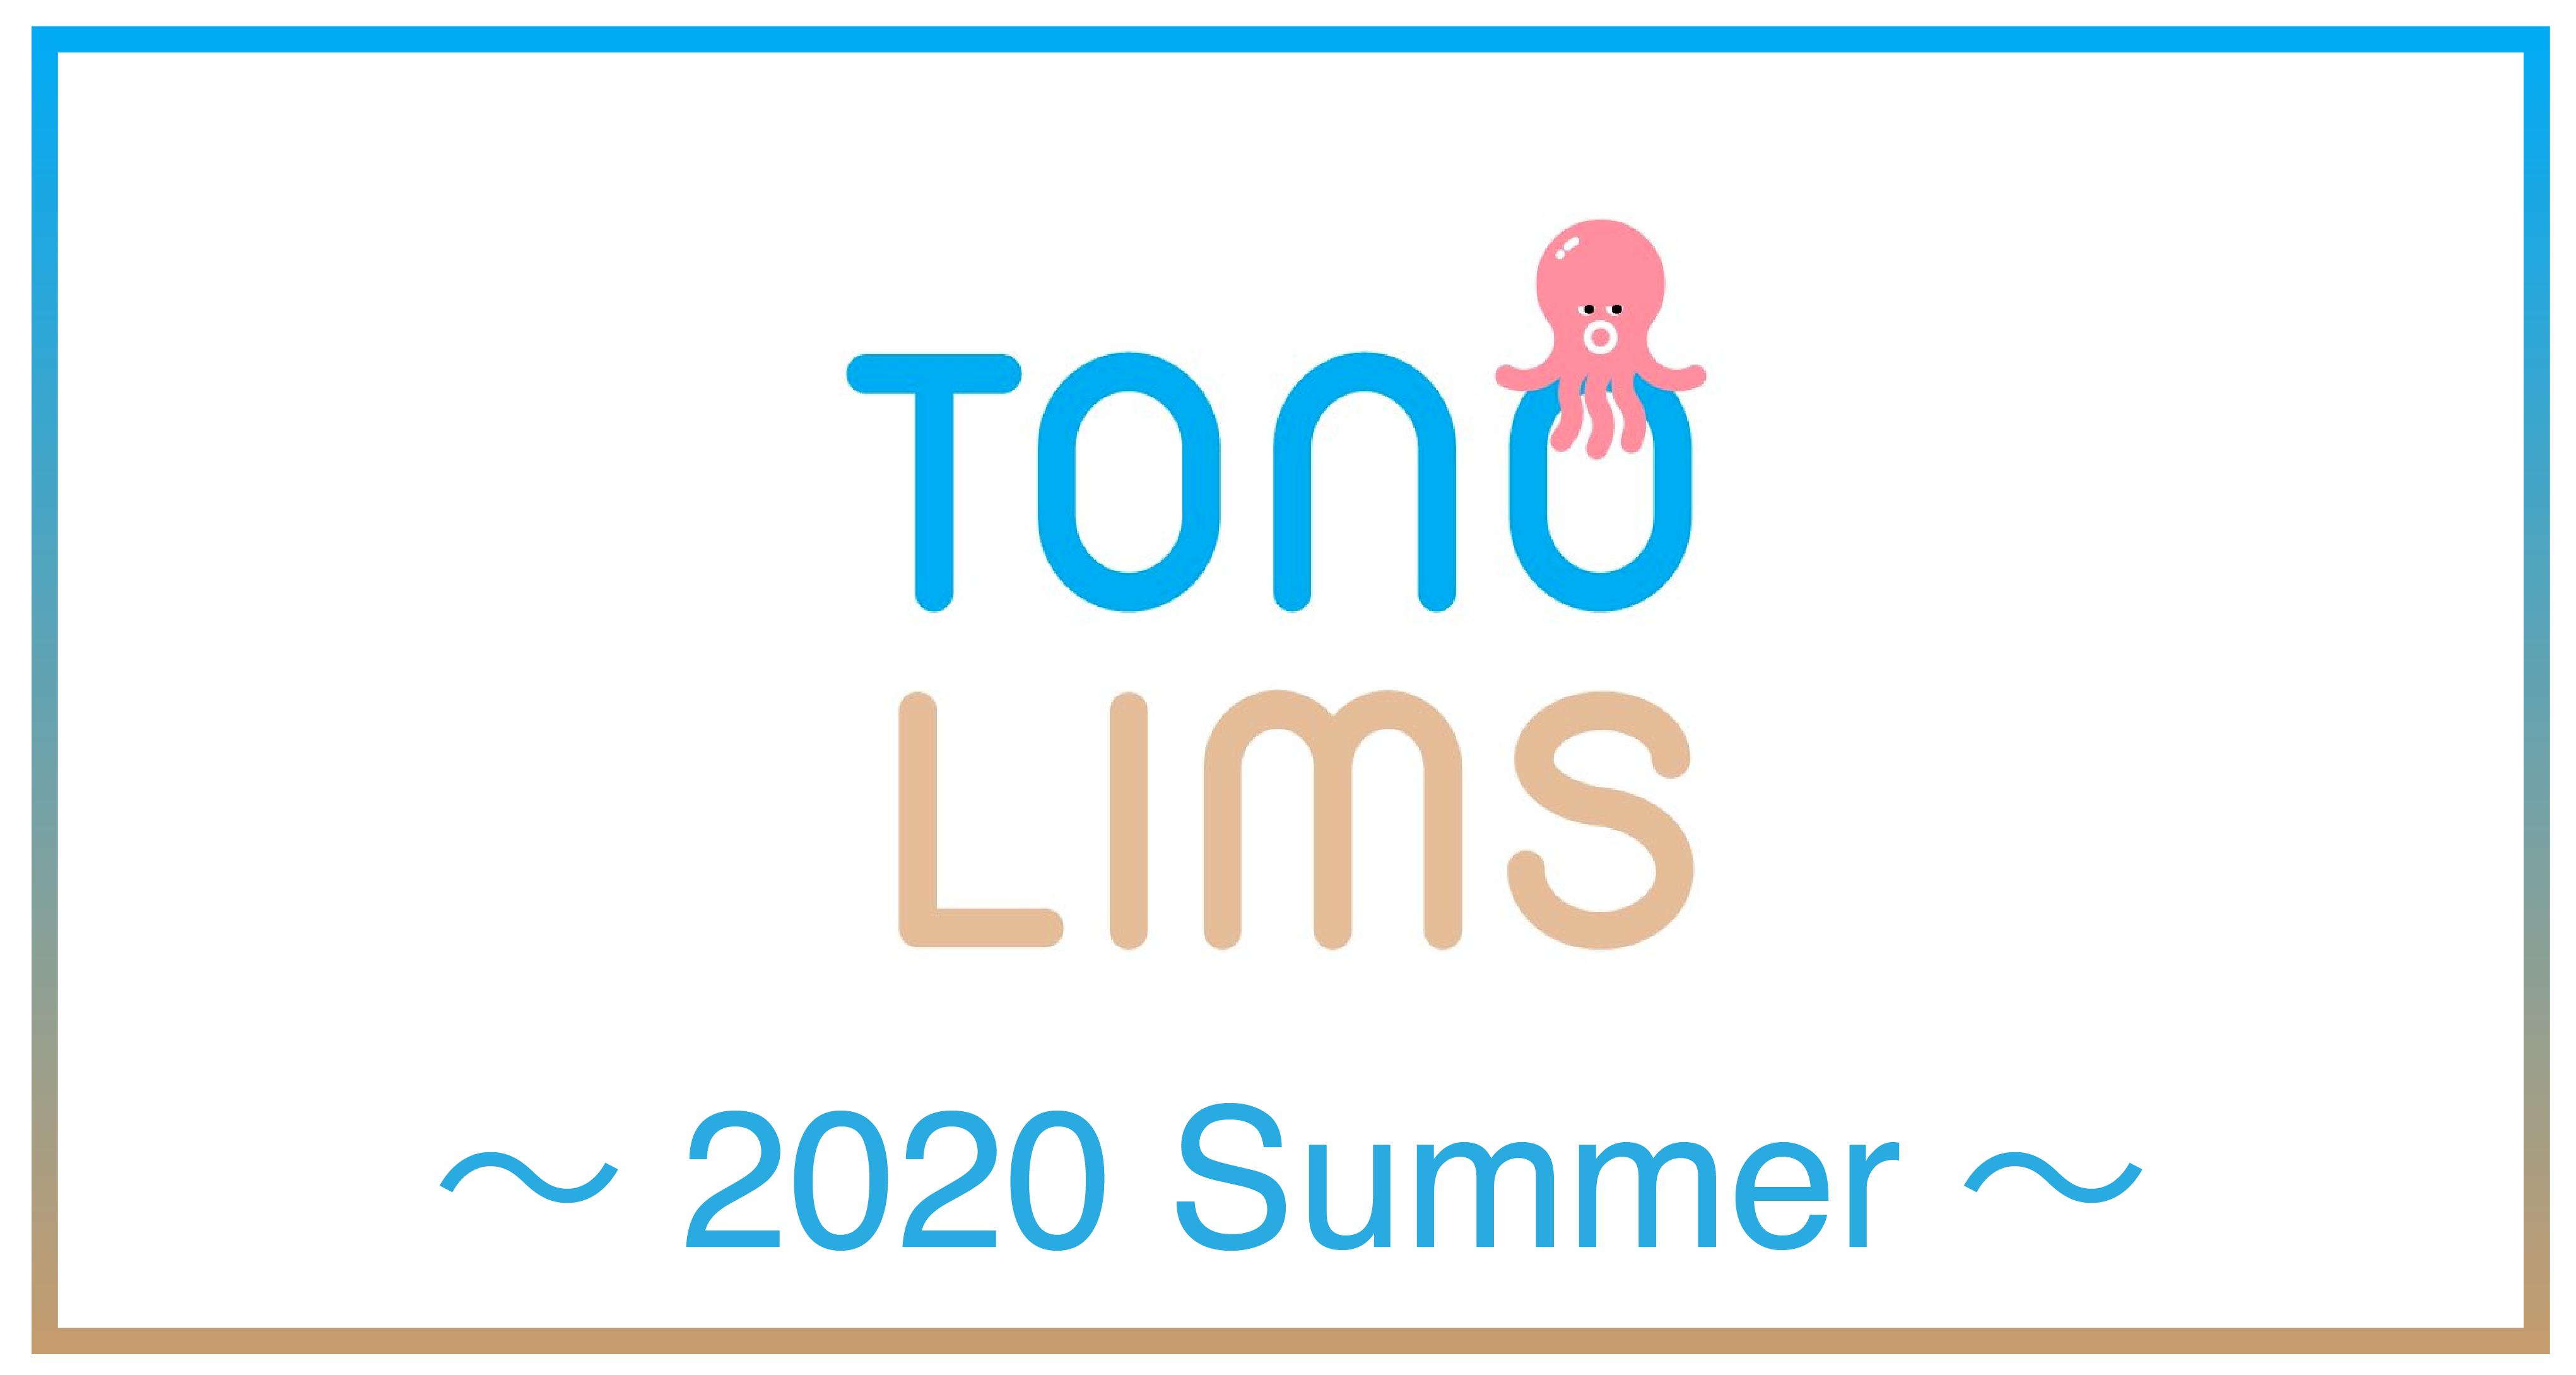 Tono&Lims Online de Space Walk 2020 Summer